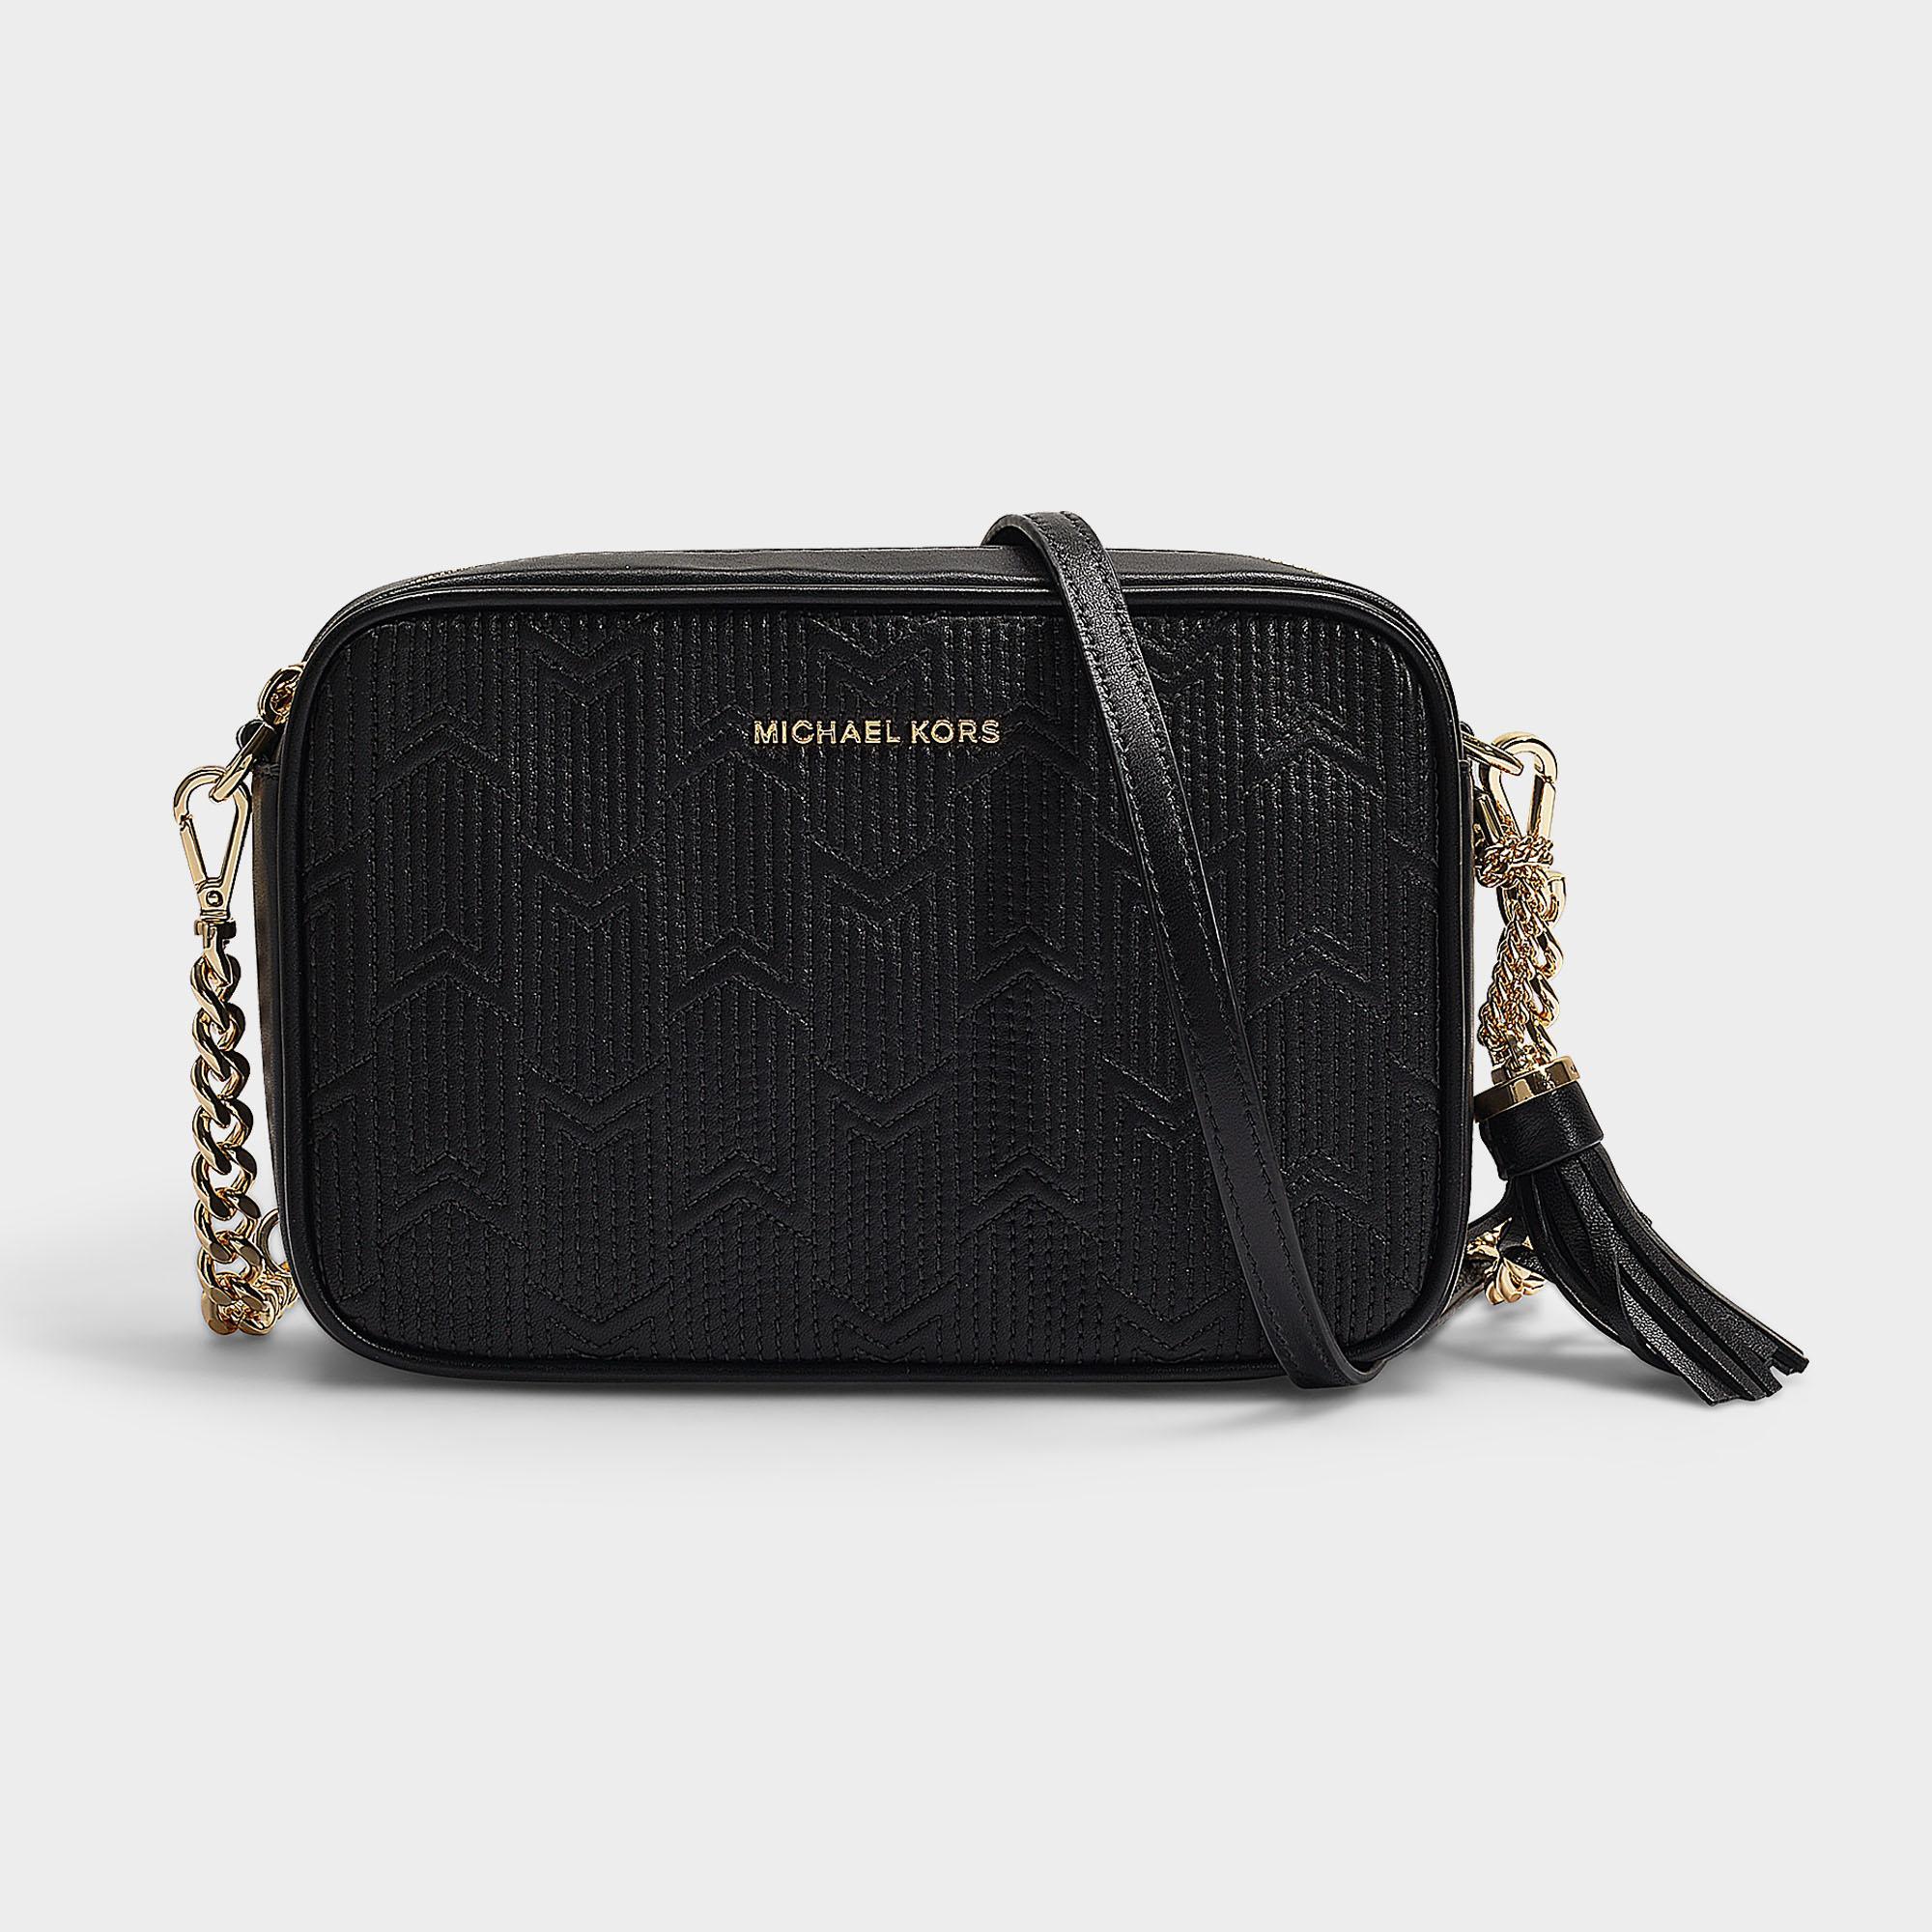 7ae318e79e7b MICHAEL Michael Kors Crossbodies Medium Camera Bag In Black Quilted ...